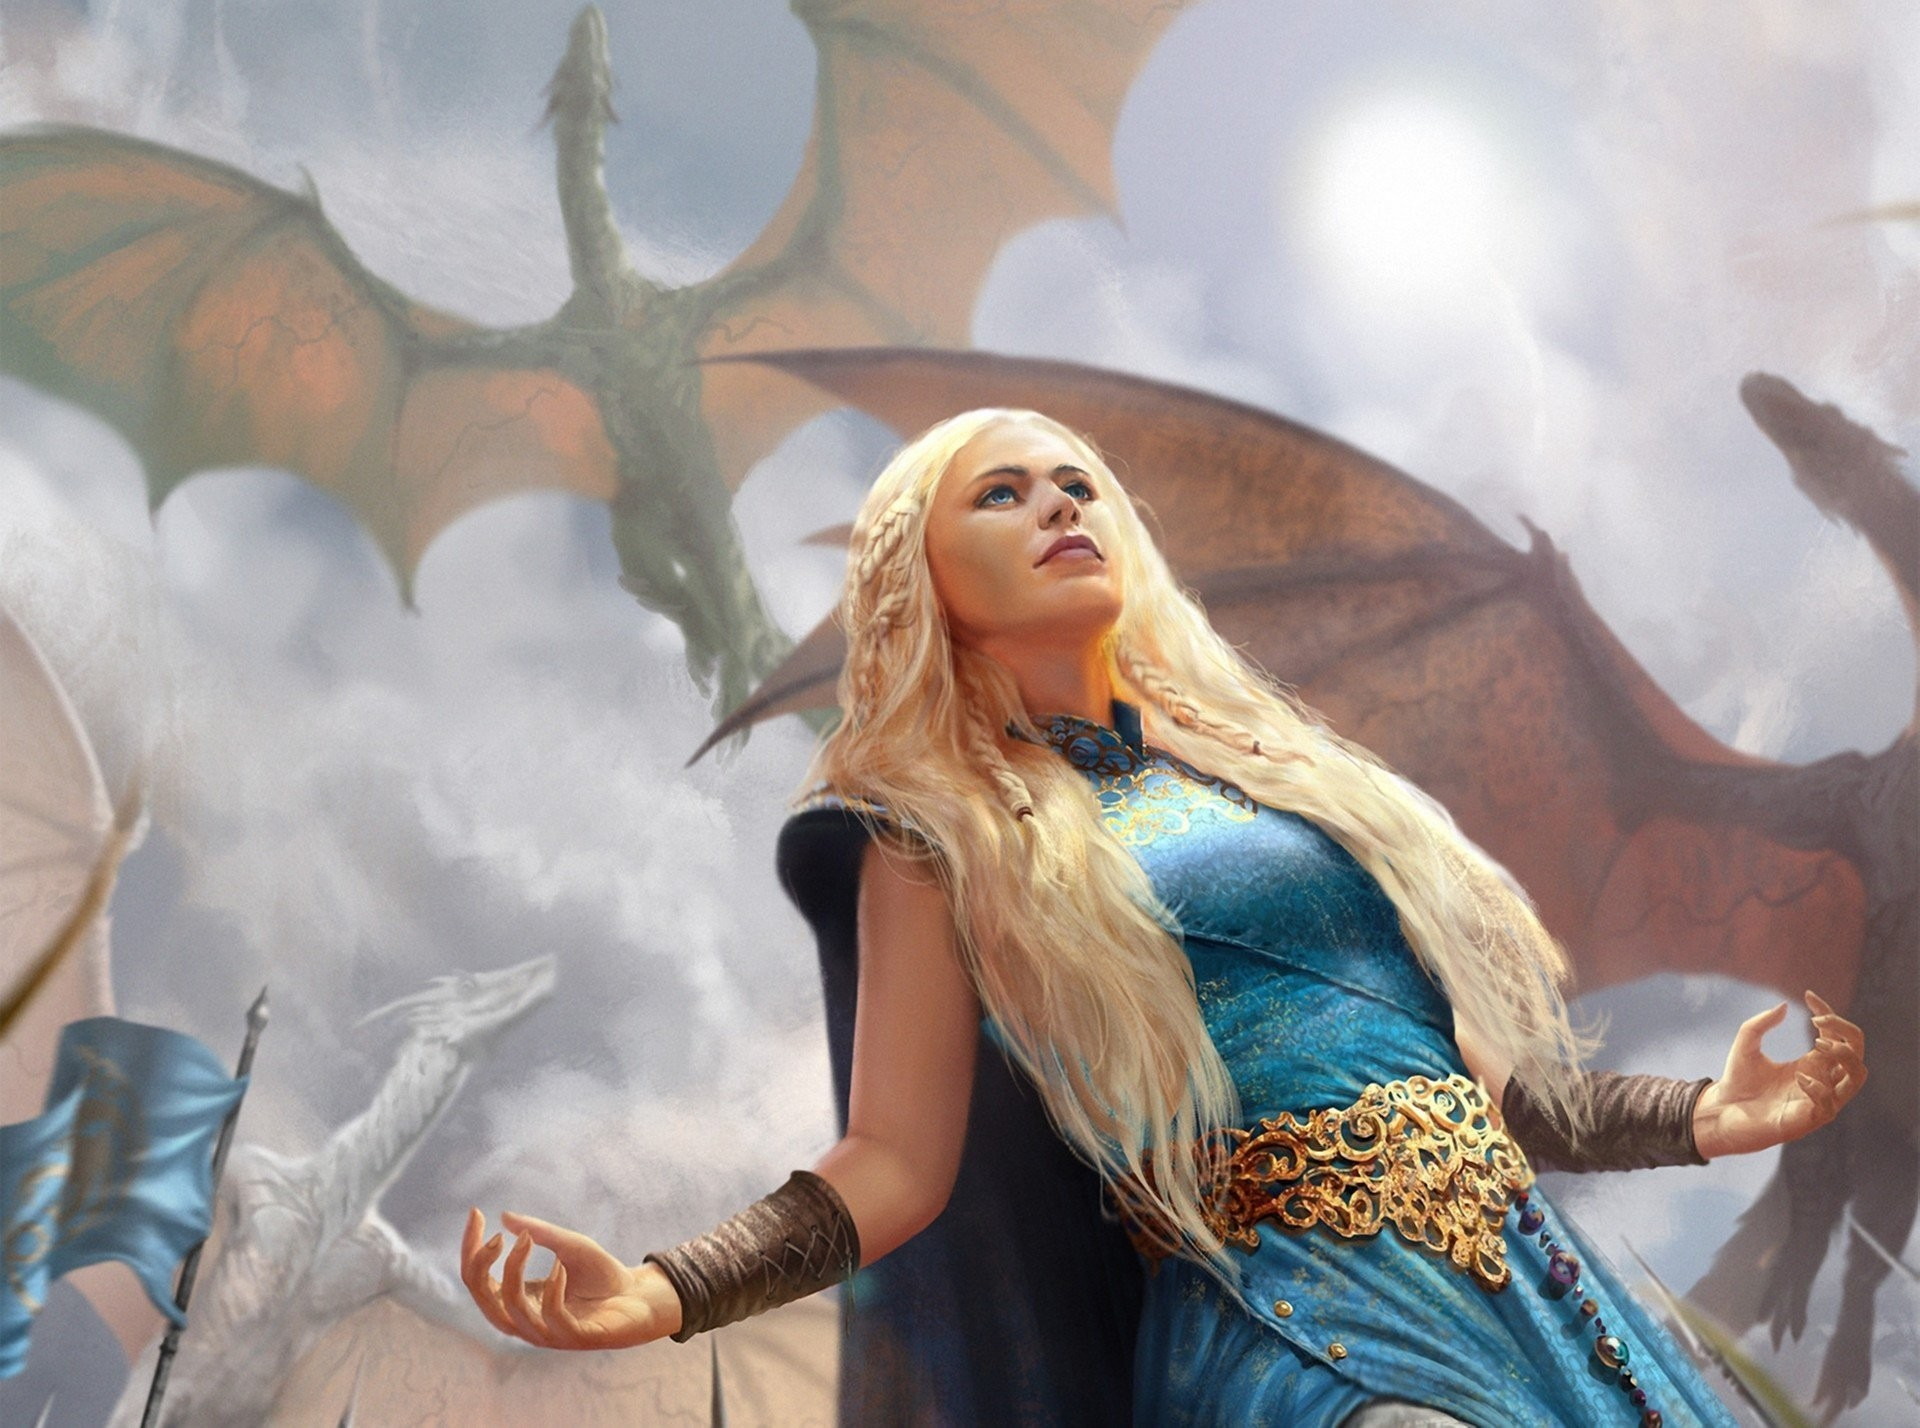 a song of ice and fire a song of ice and fire daenerys targaryen mother of